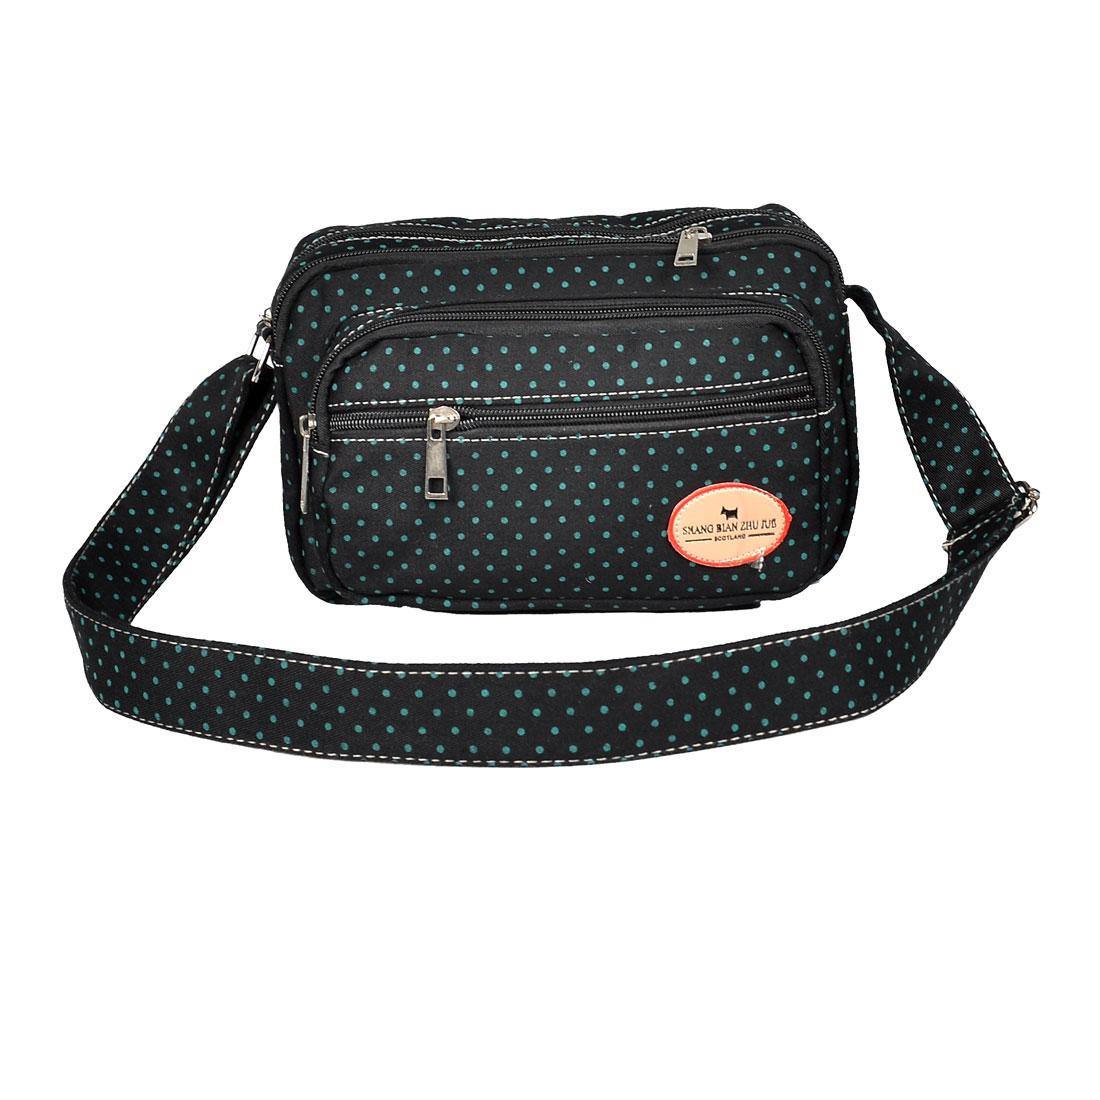 Zipper Closure Dot Pattern 4 Pockets Black Shoulder Bag Handbag for Woman